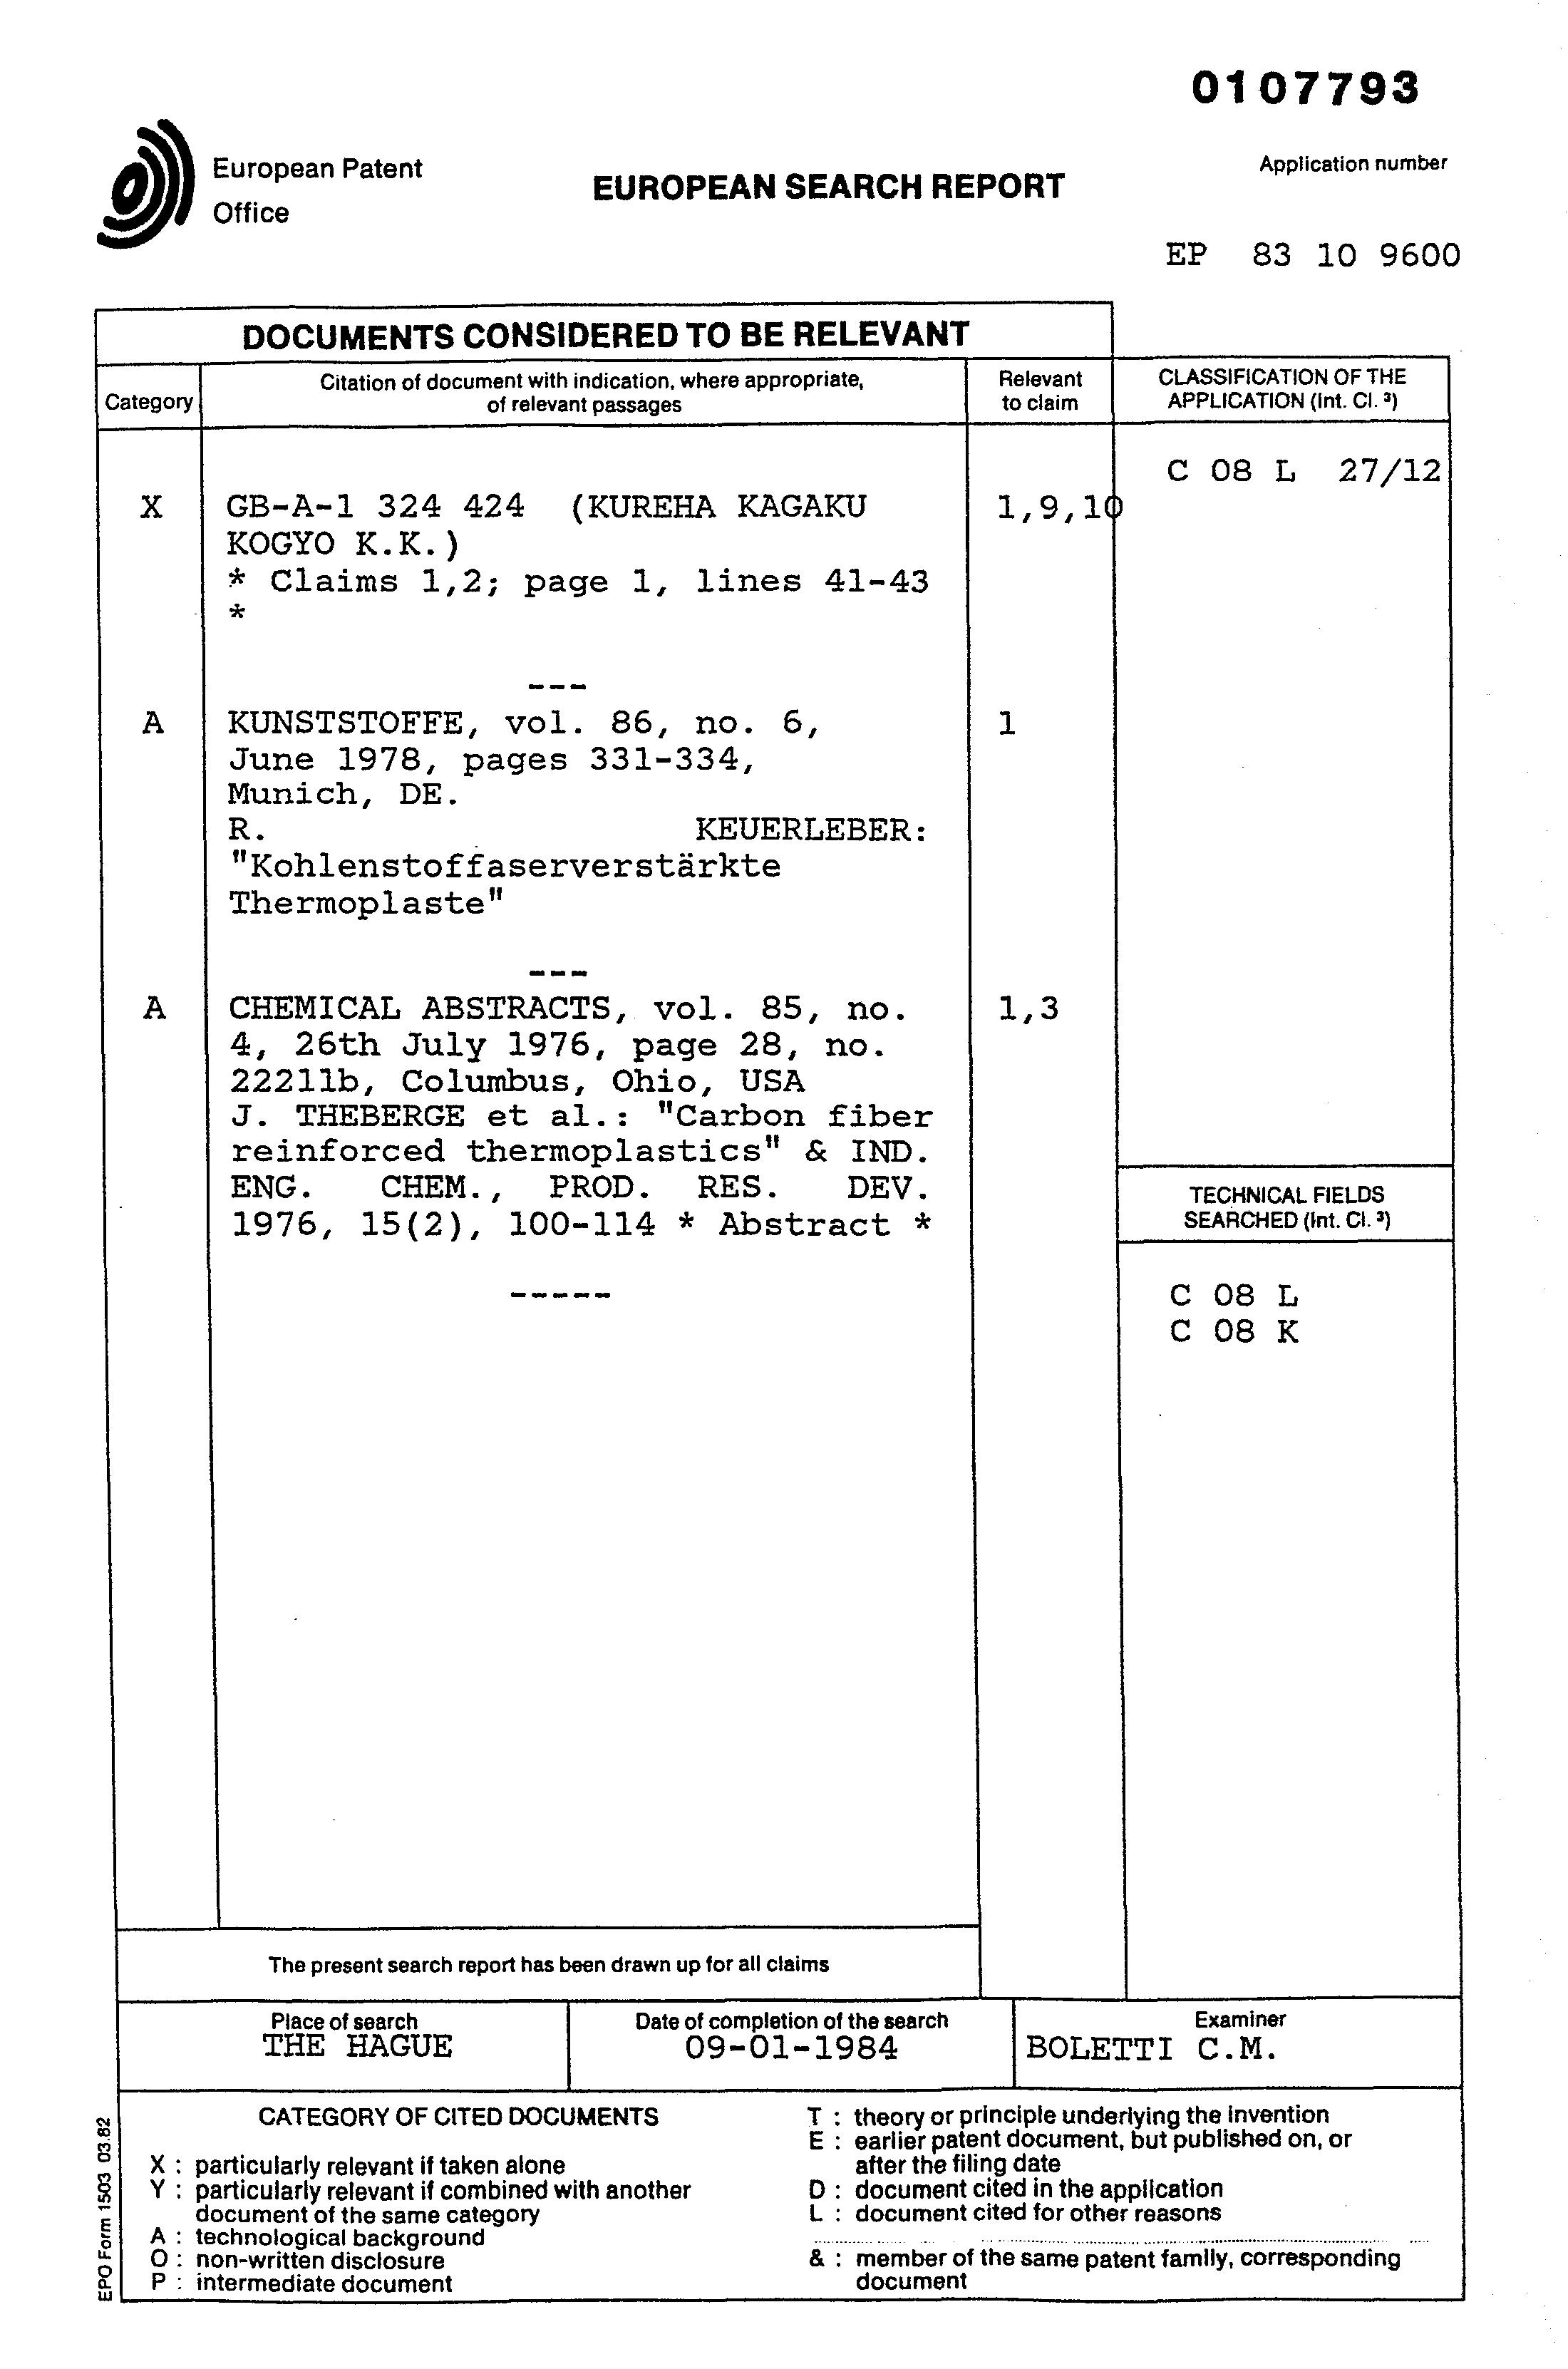 Brevet Ep0107793a1 Carbon Fiber Containing